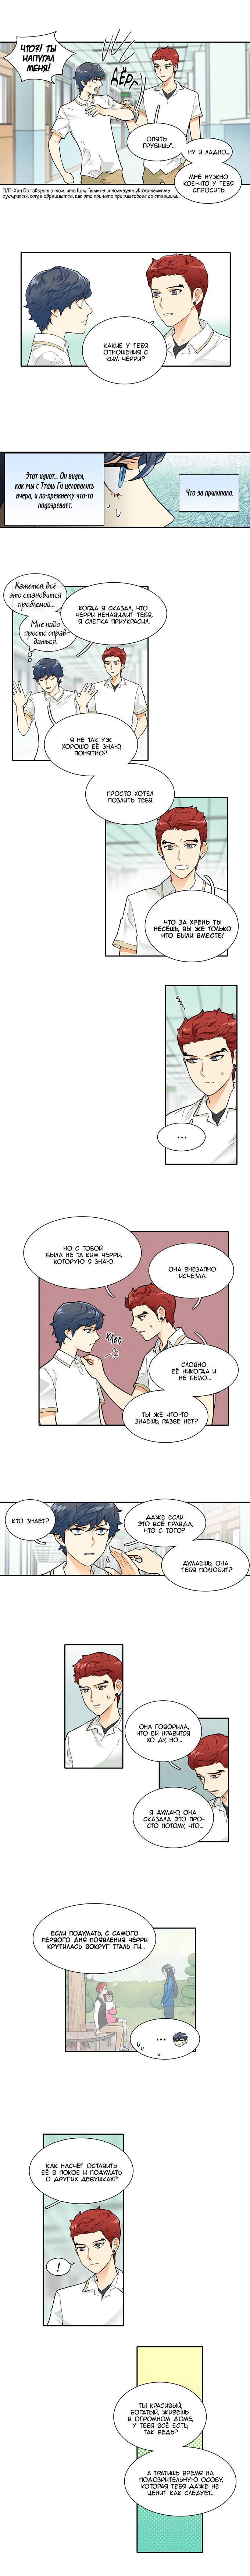 https://r1.ninemanga.com/comics/pic2/41/21609/214792/1428304838750.jpg Page 8